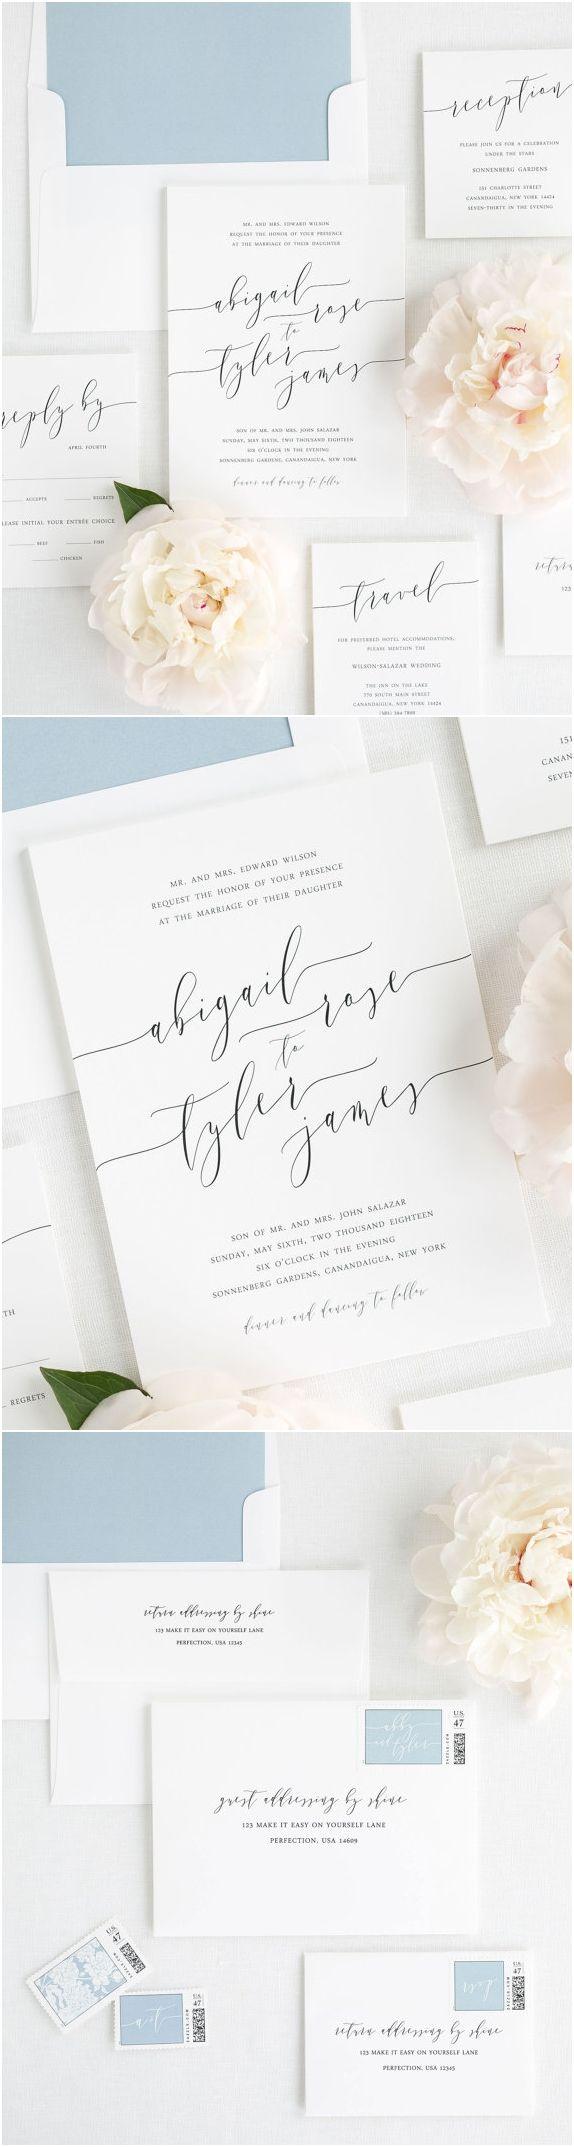 Romantic Calligraphy Wedding Invitations Deposit